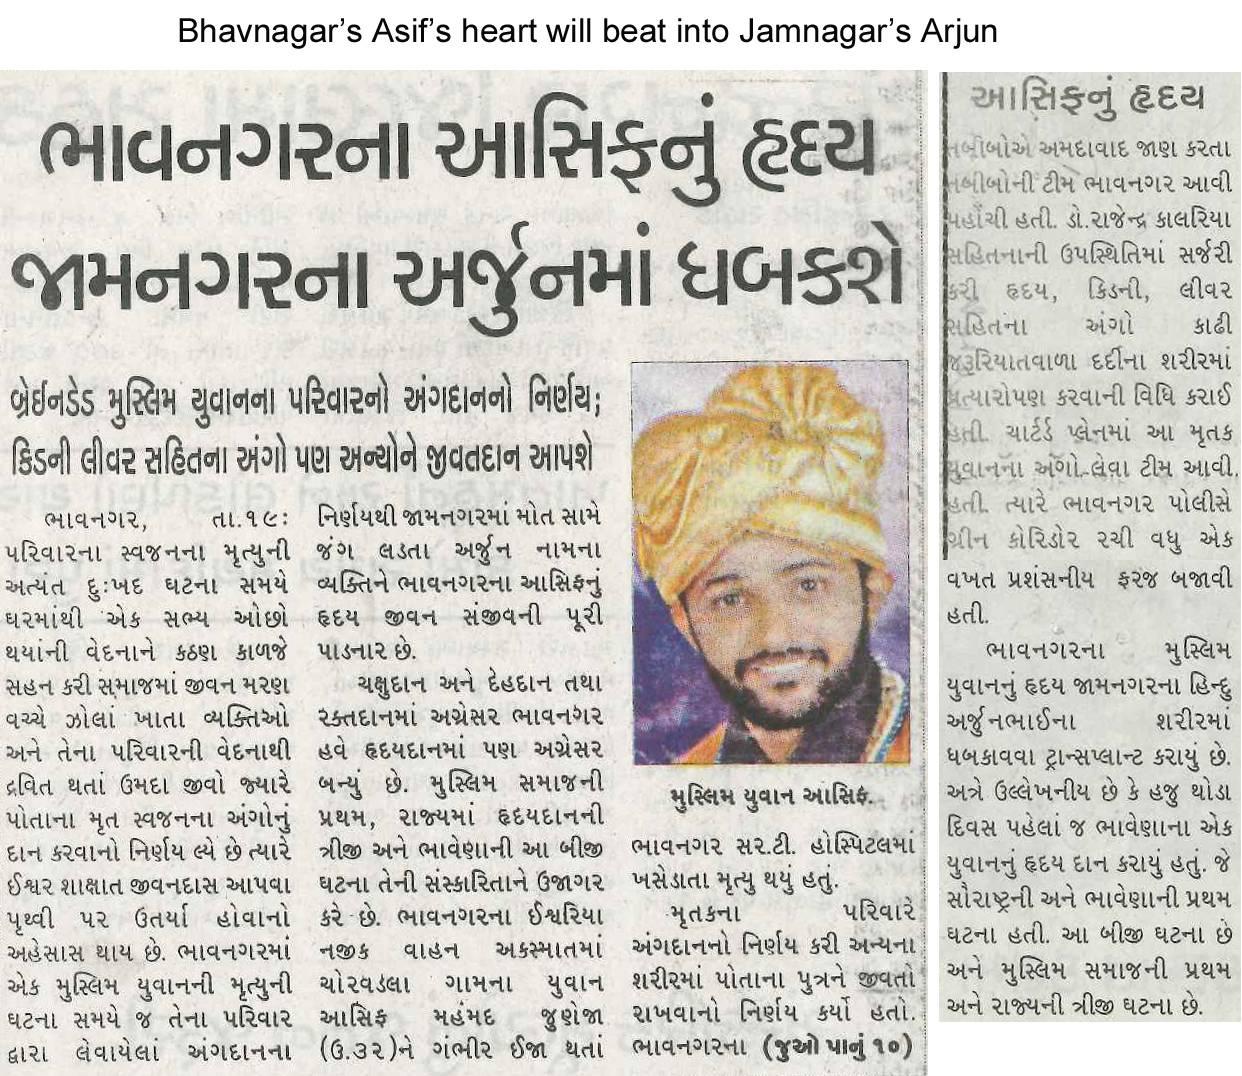 Phulchhab (Rajkot)_CIMS (1st Heart transplant in Gujarat)_20.12.16_Pg 12